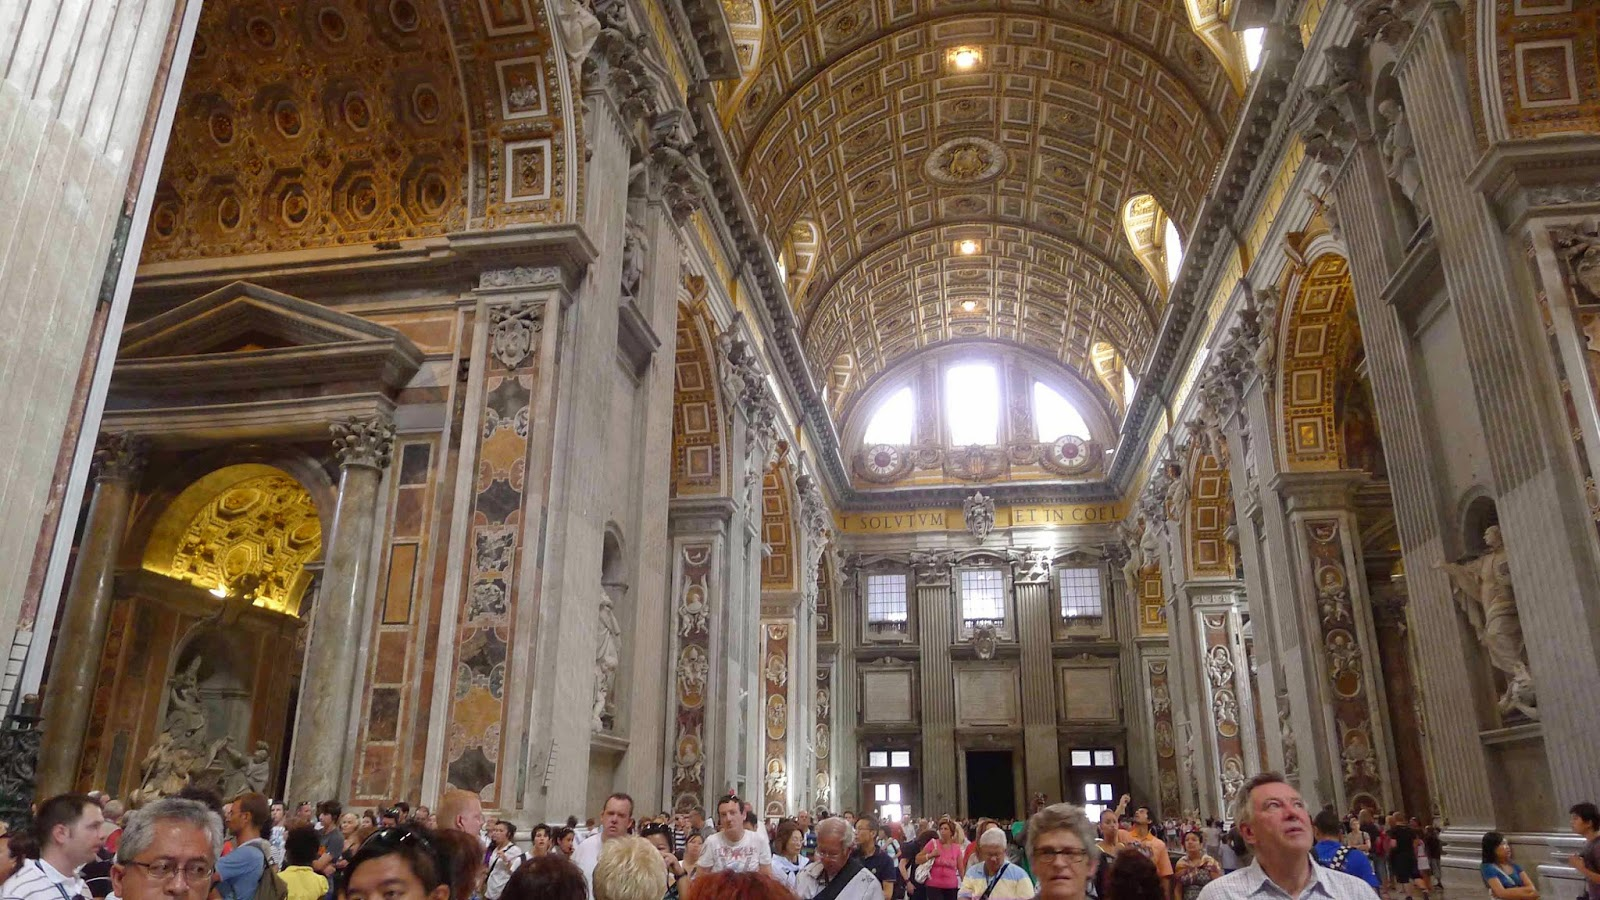 St. Peter's Basilica